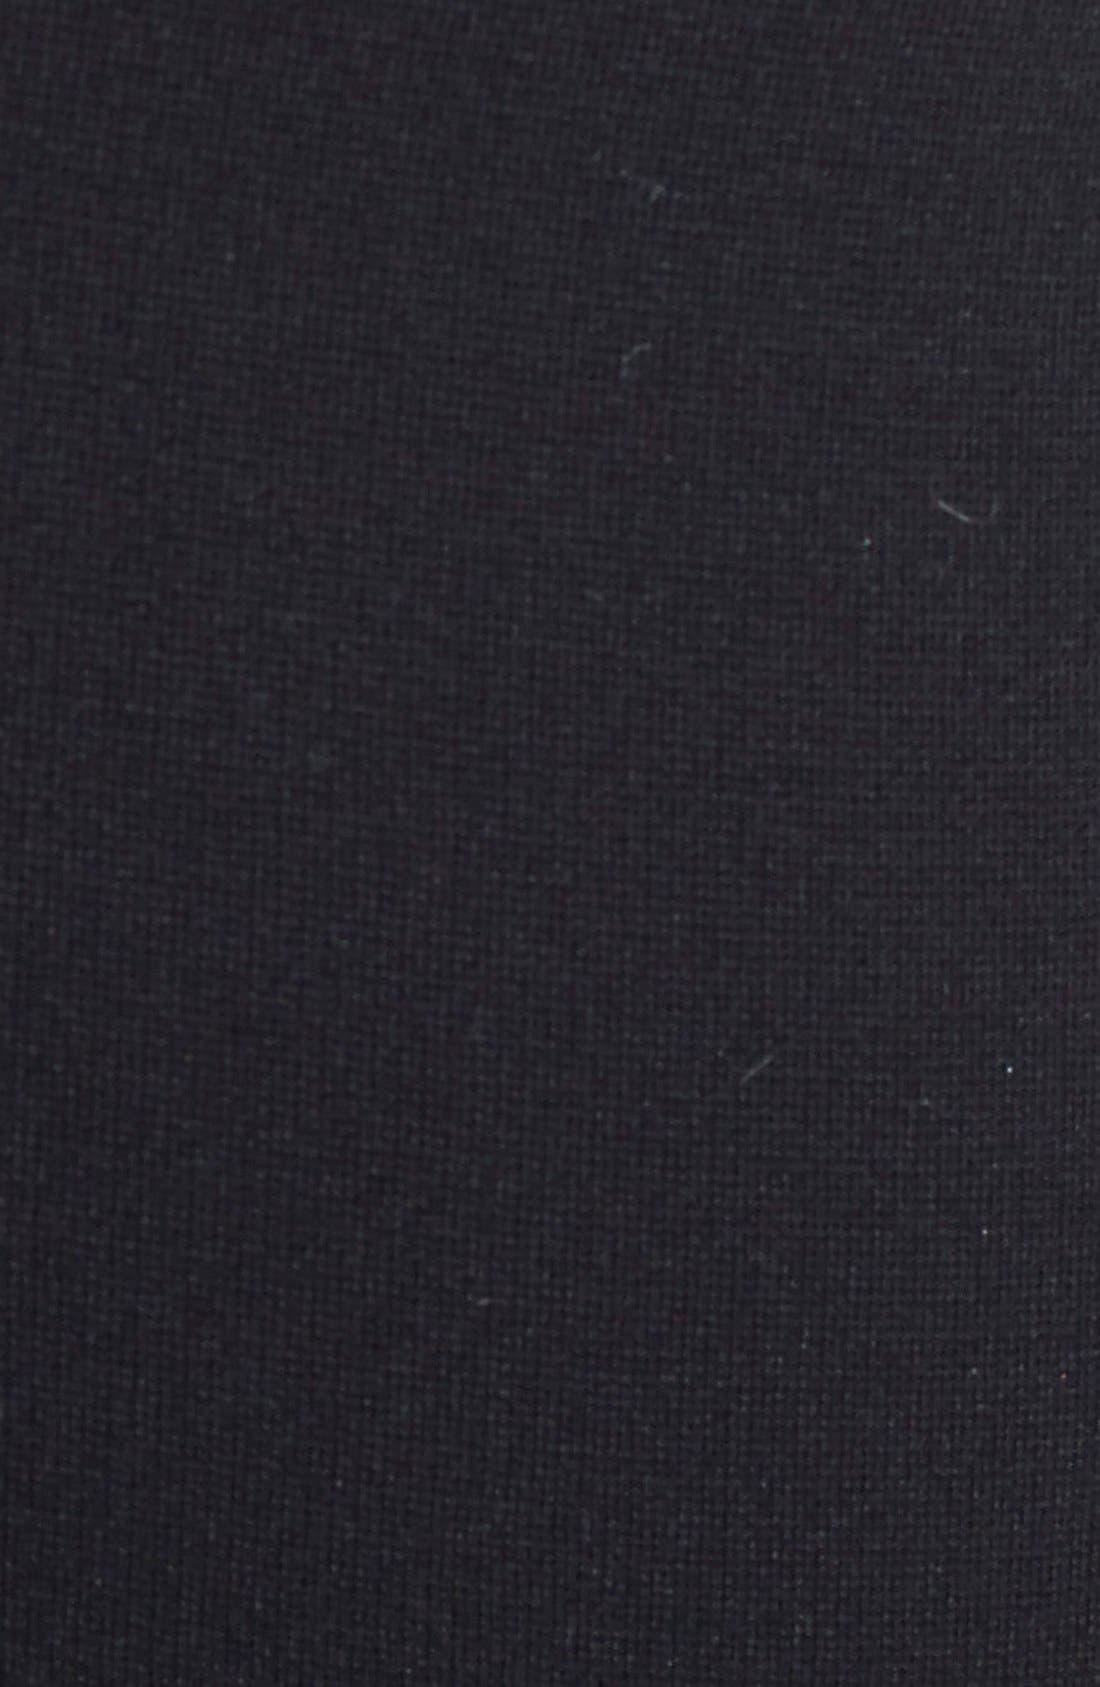 Alternate Image 3  - Eva Alexander London Tailored Ponte Knit Maternity Pencil Skirt